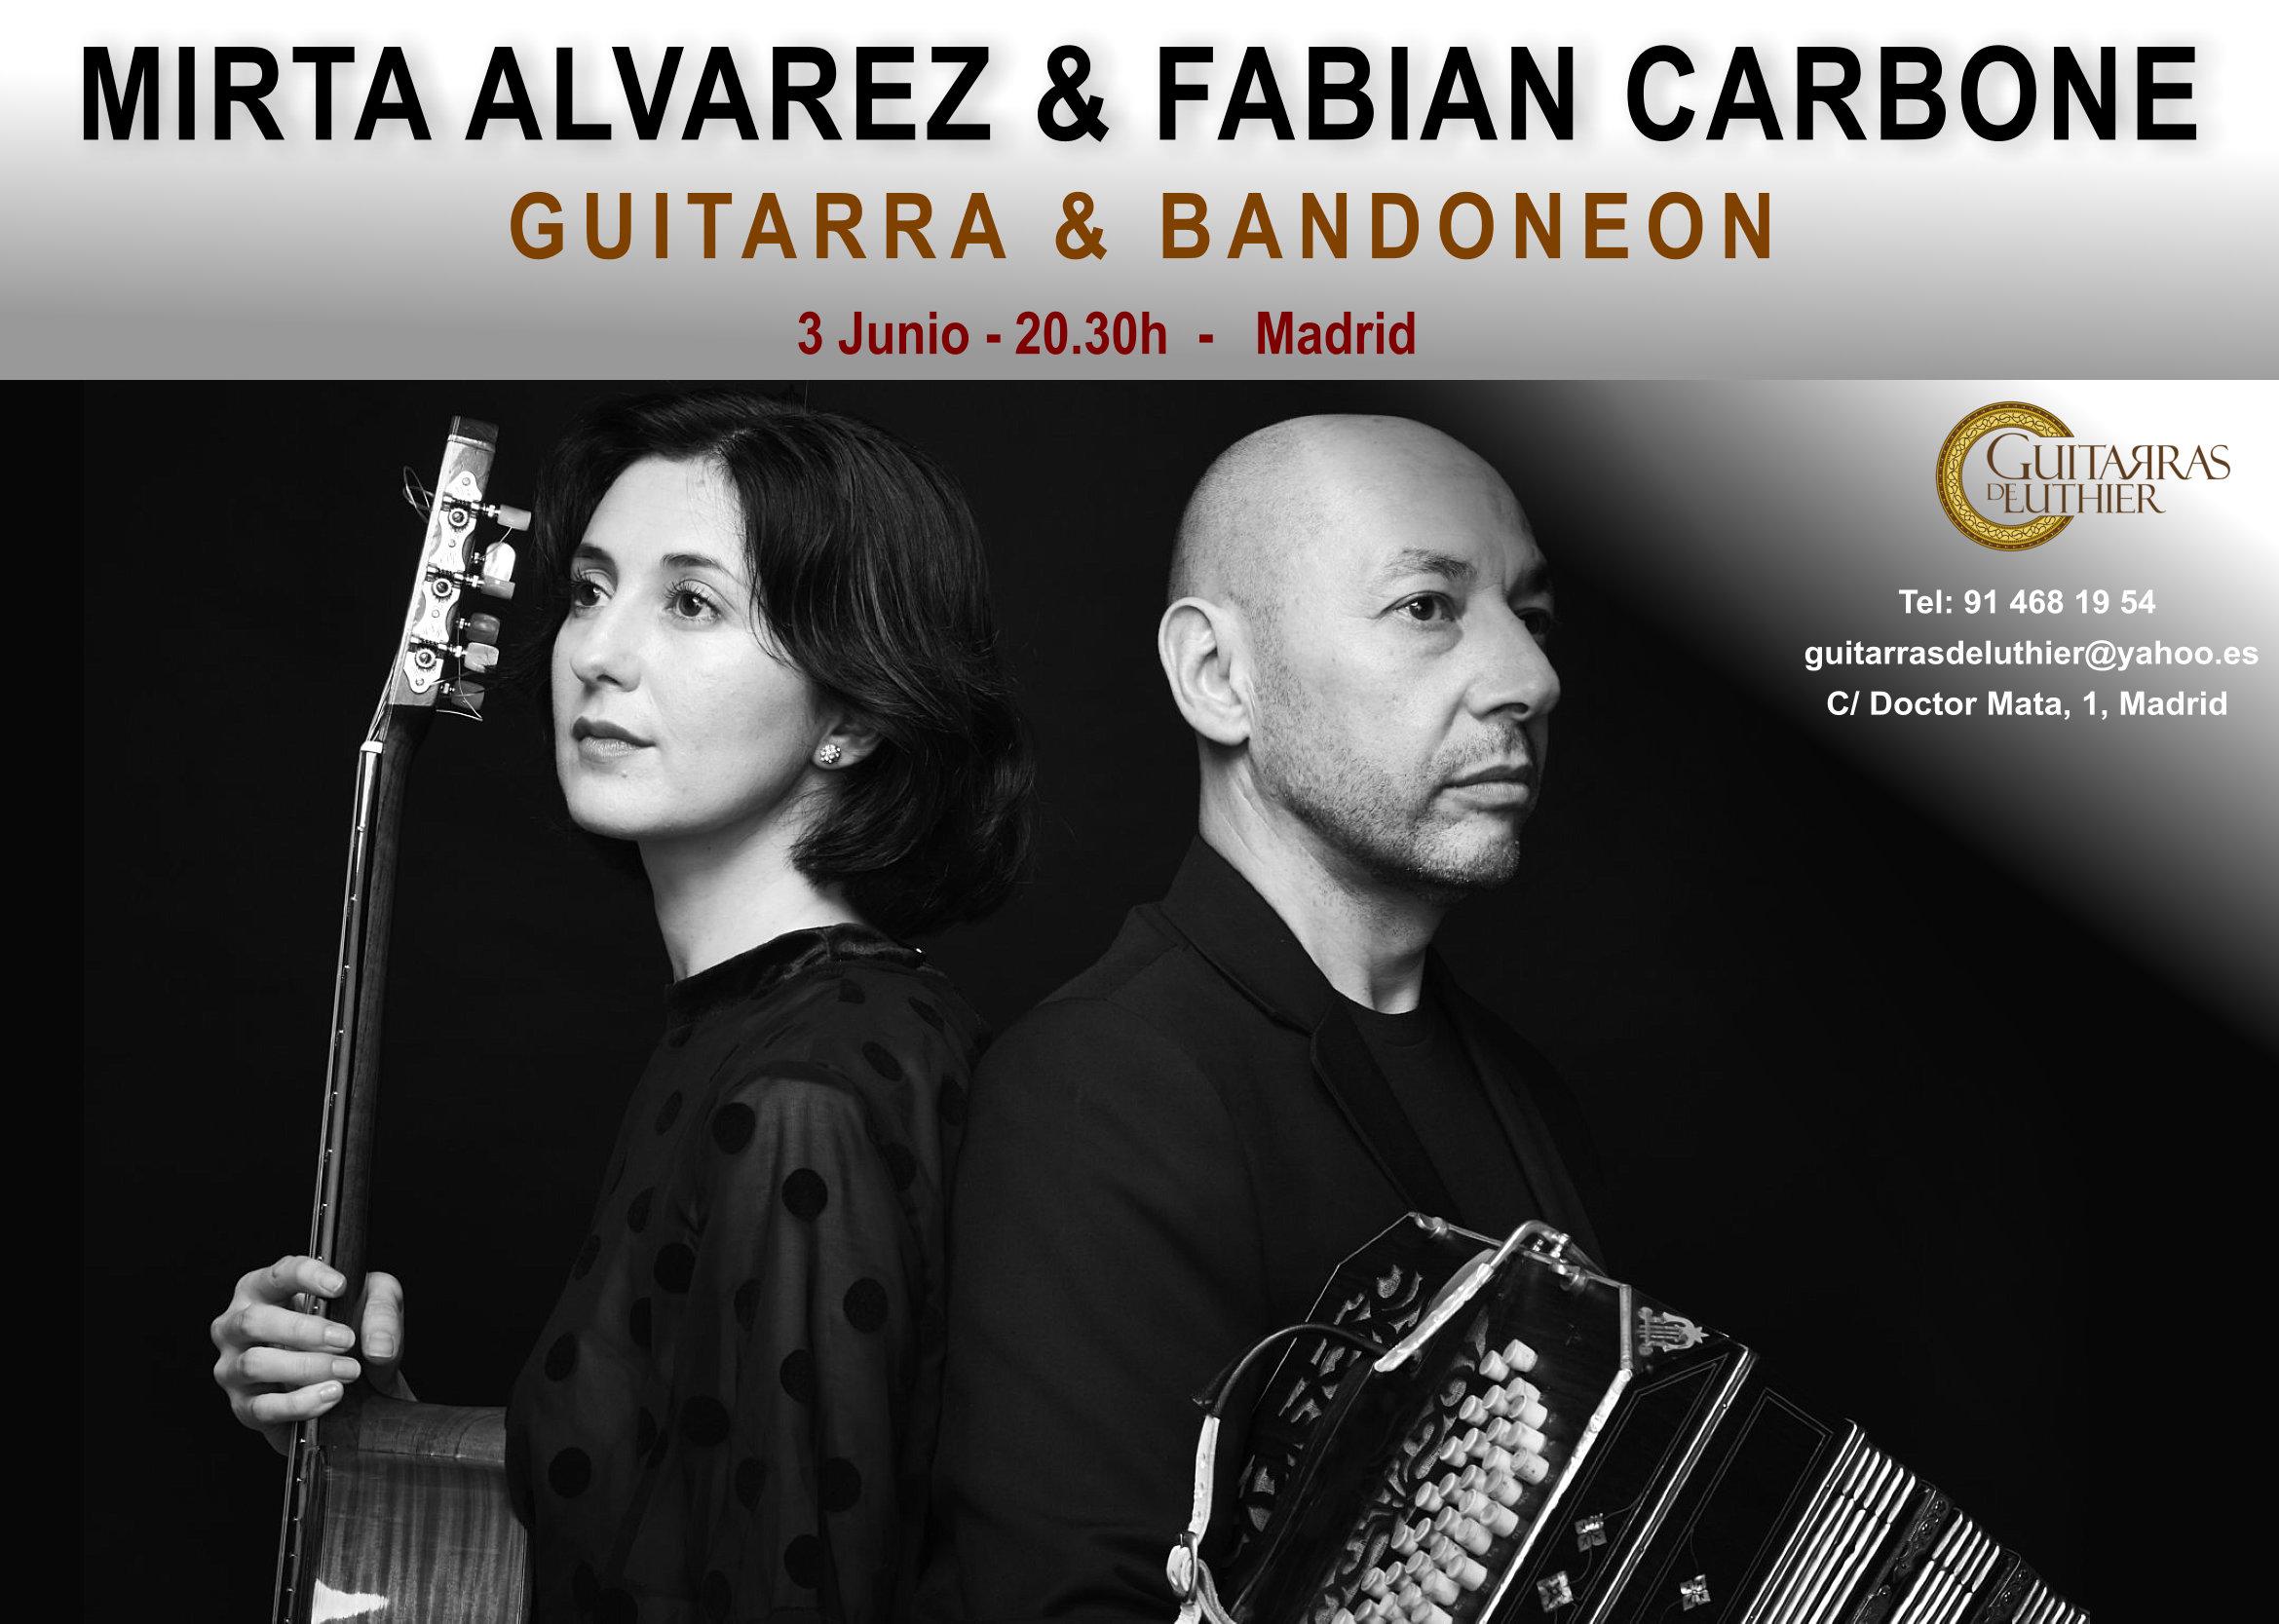 http://www.guitarrasdeluthier.com/es/agenda/guitar-tango-bandonen/40